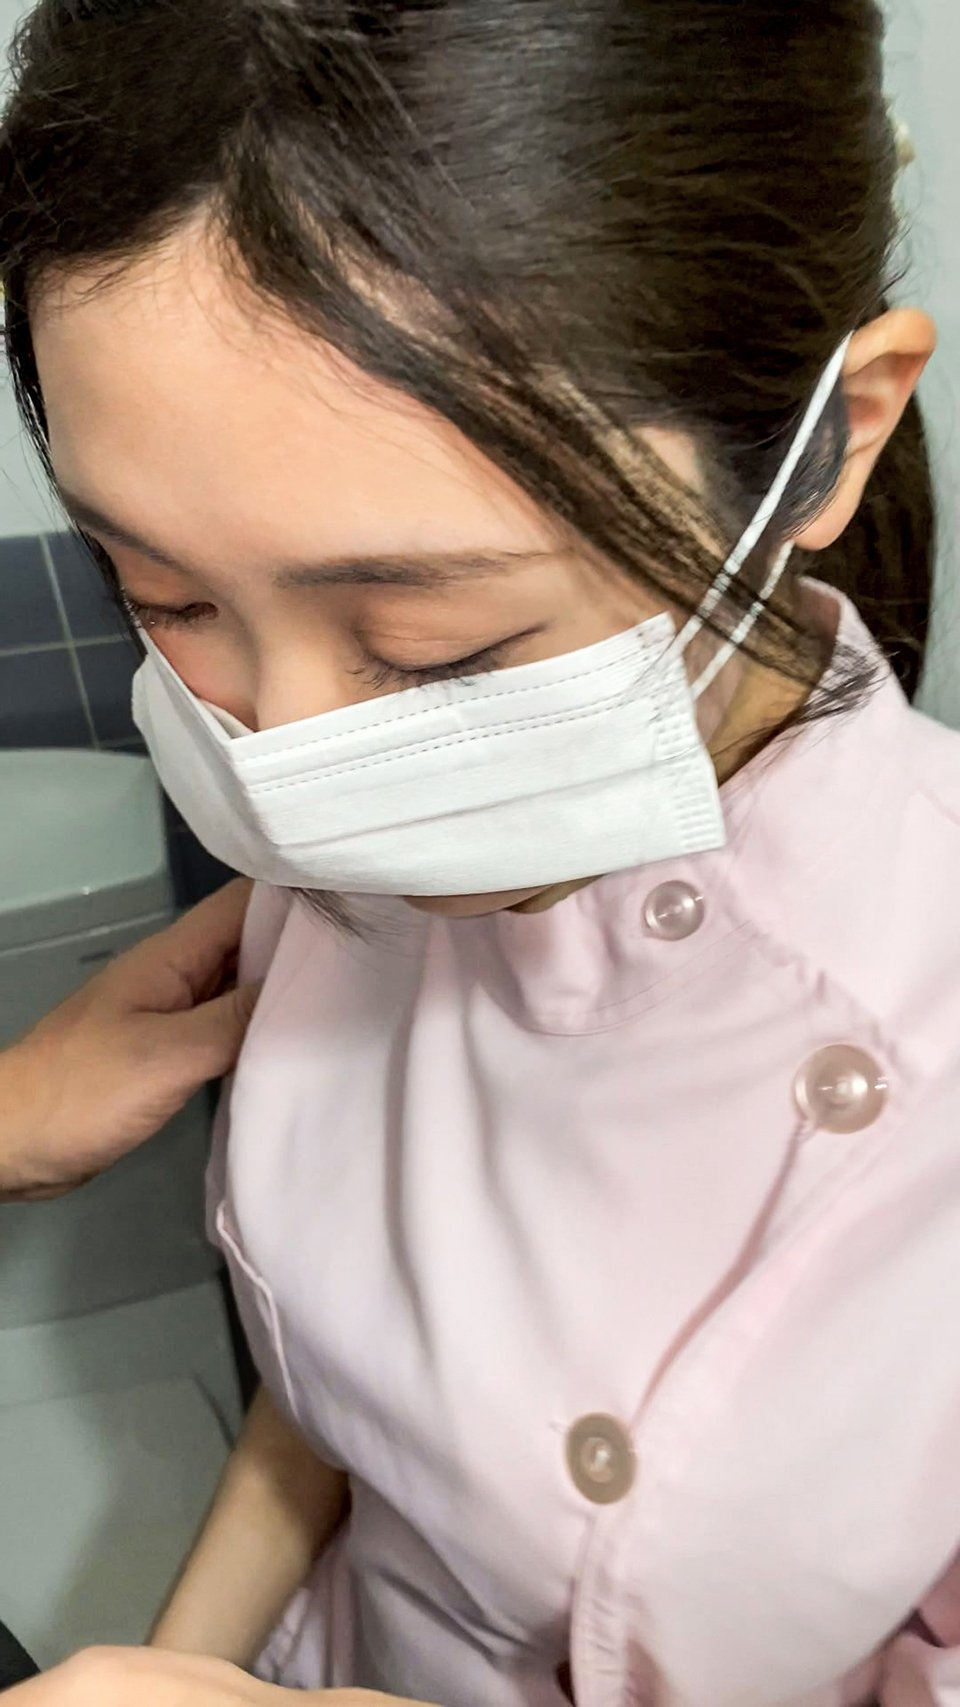 FC2 PPV 1782876 【コロナ前の病院】(流出)三重 病院 ナース 27歳 入院患者とお楽しみの映像。個室で乳だしてペニスをシャブり精子を吸い取る【削除予定注意】